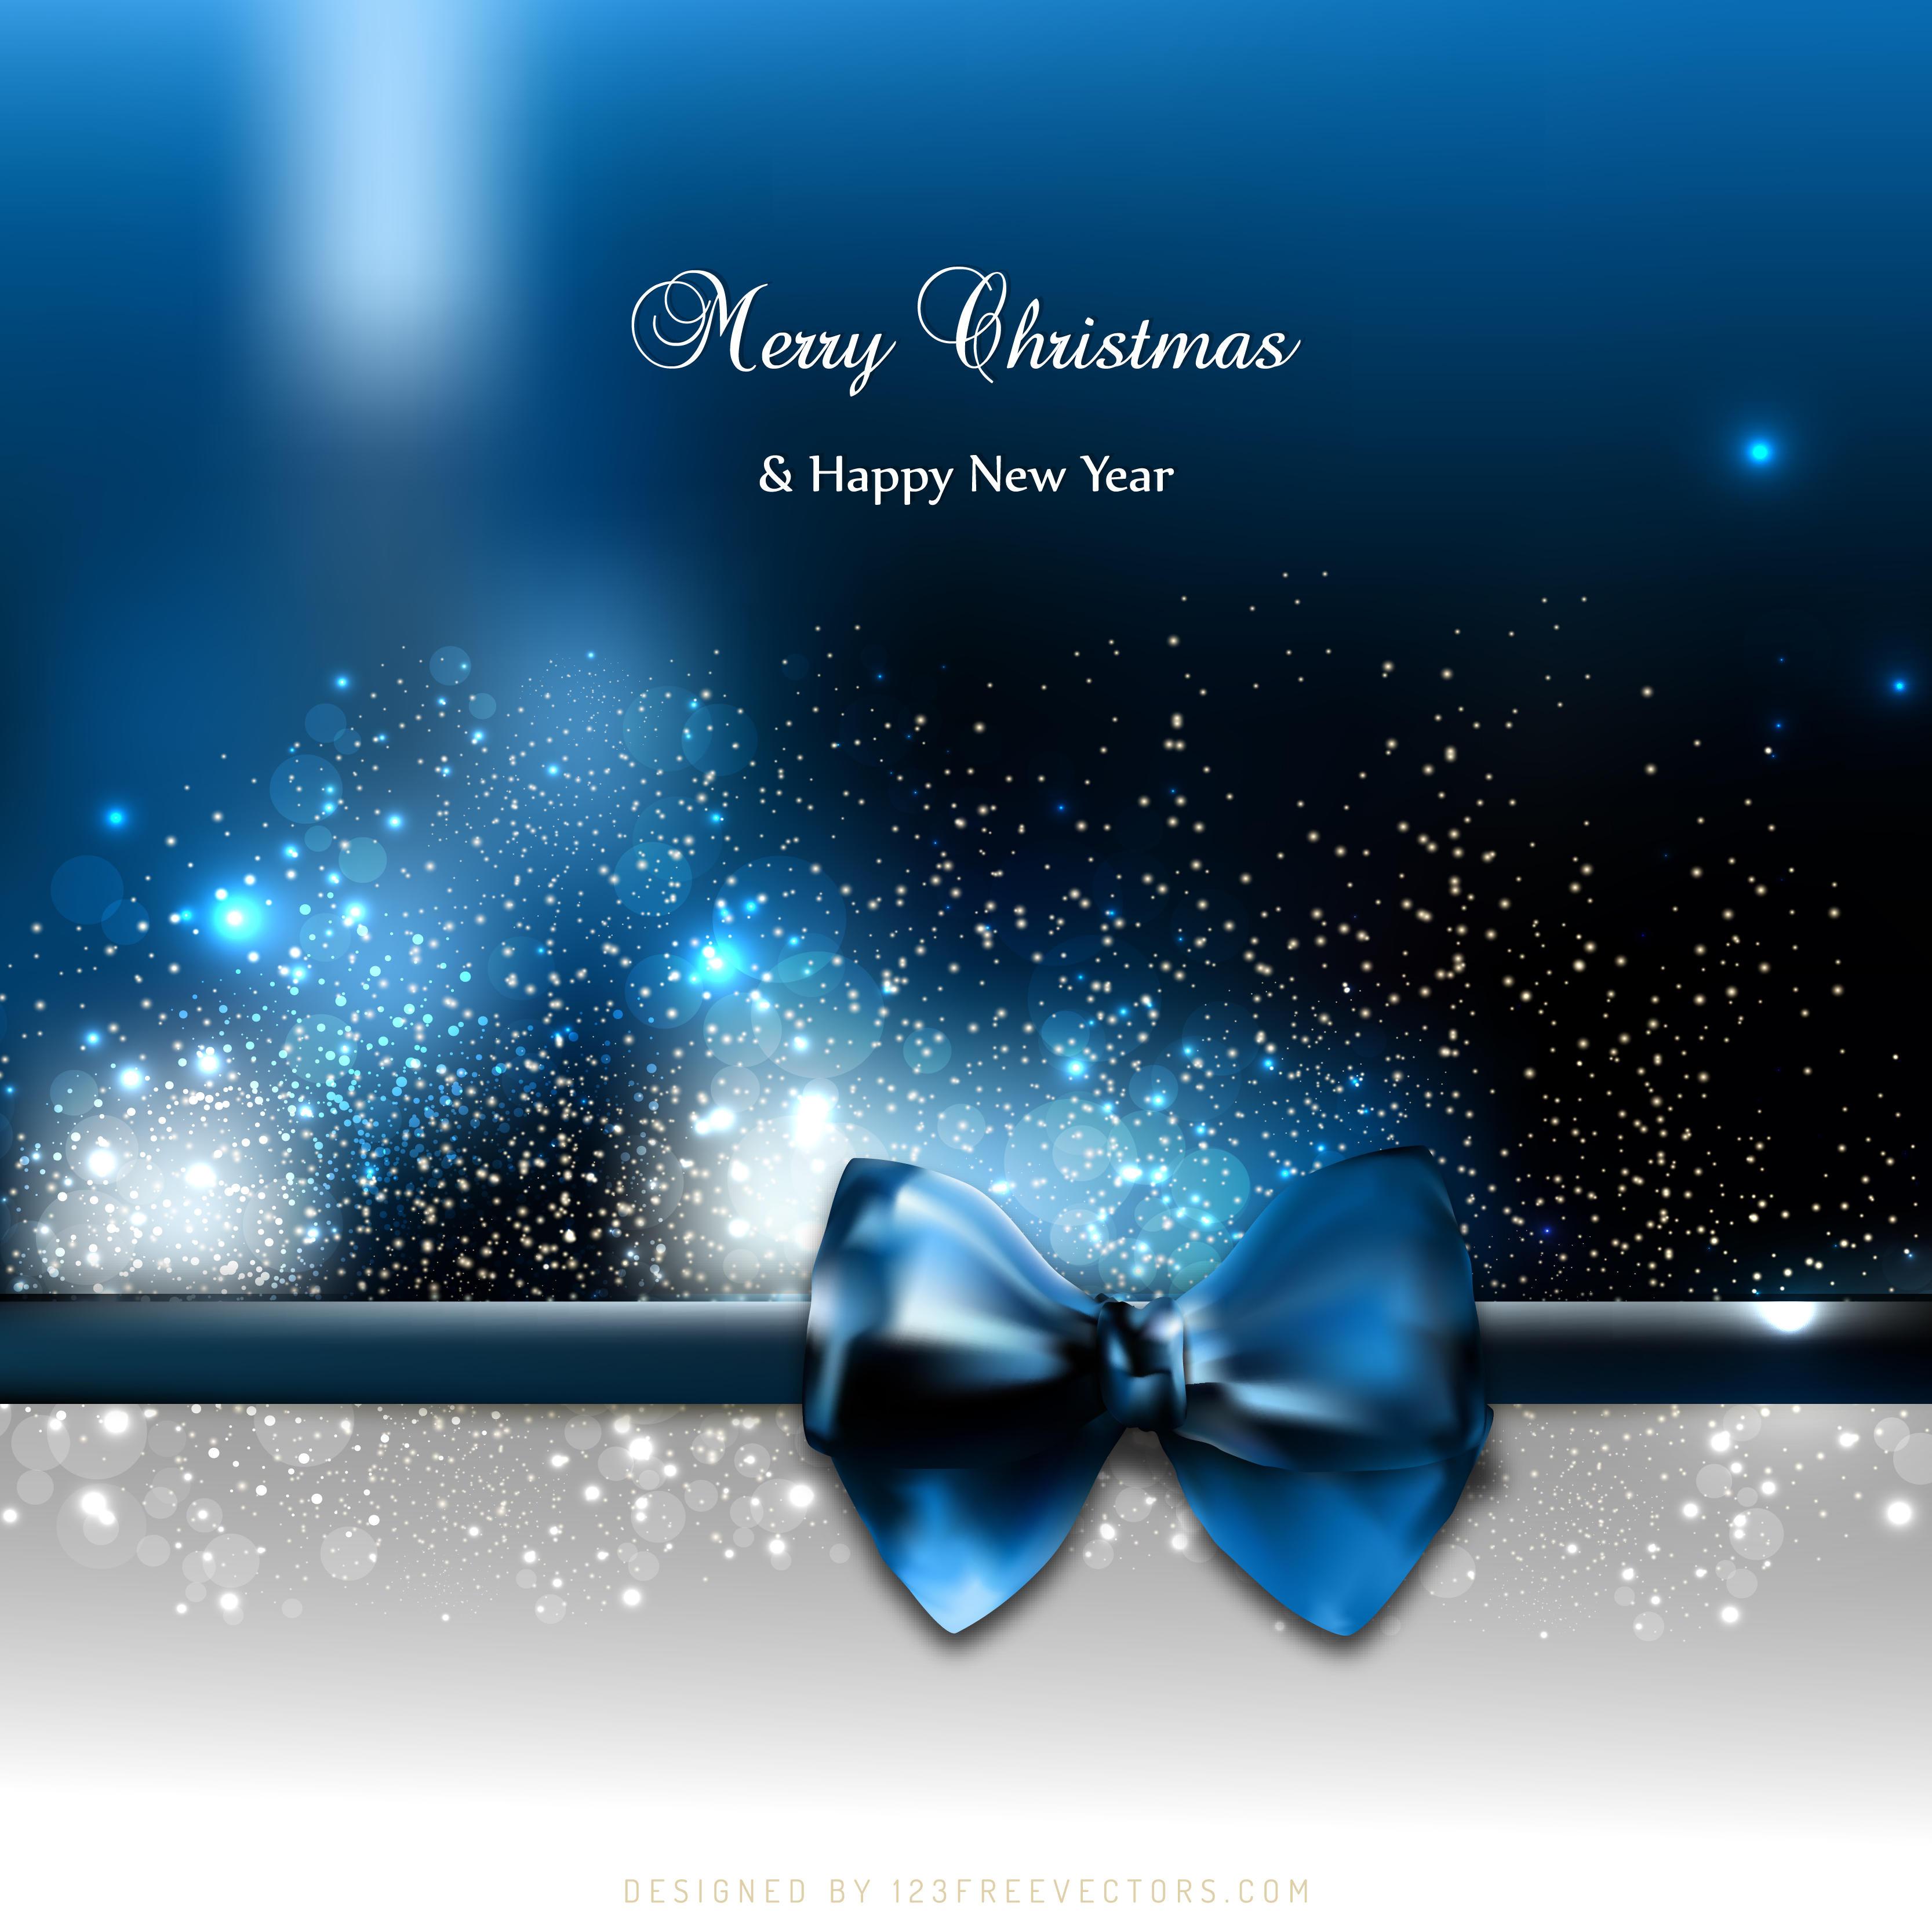 780 Blue Christmas Background Vectors